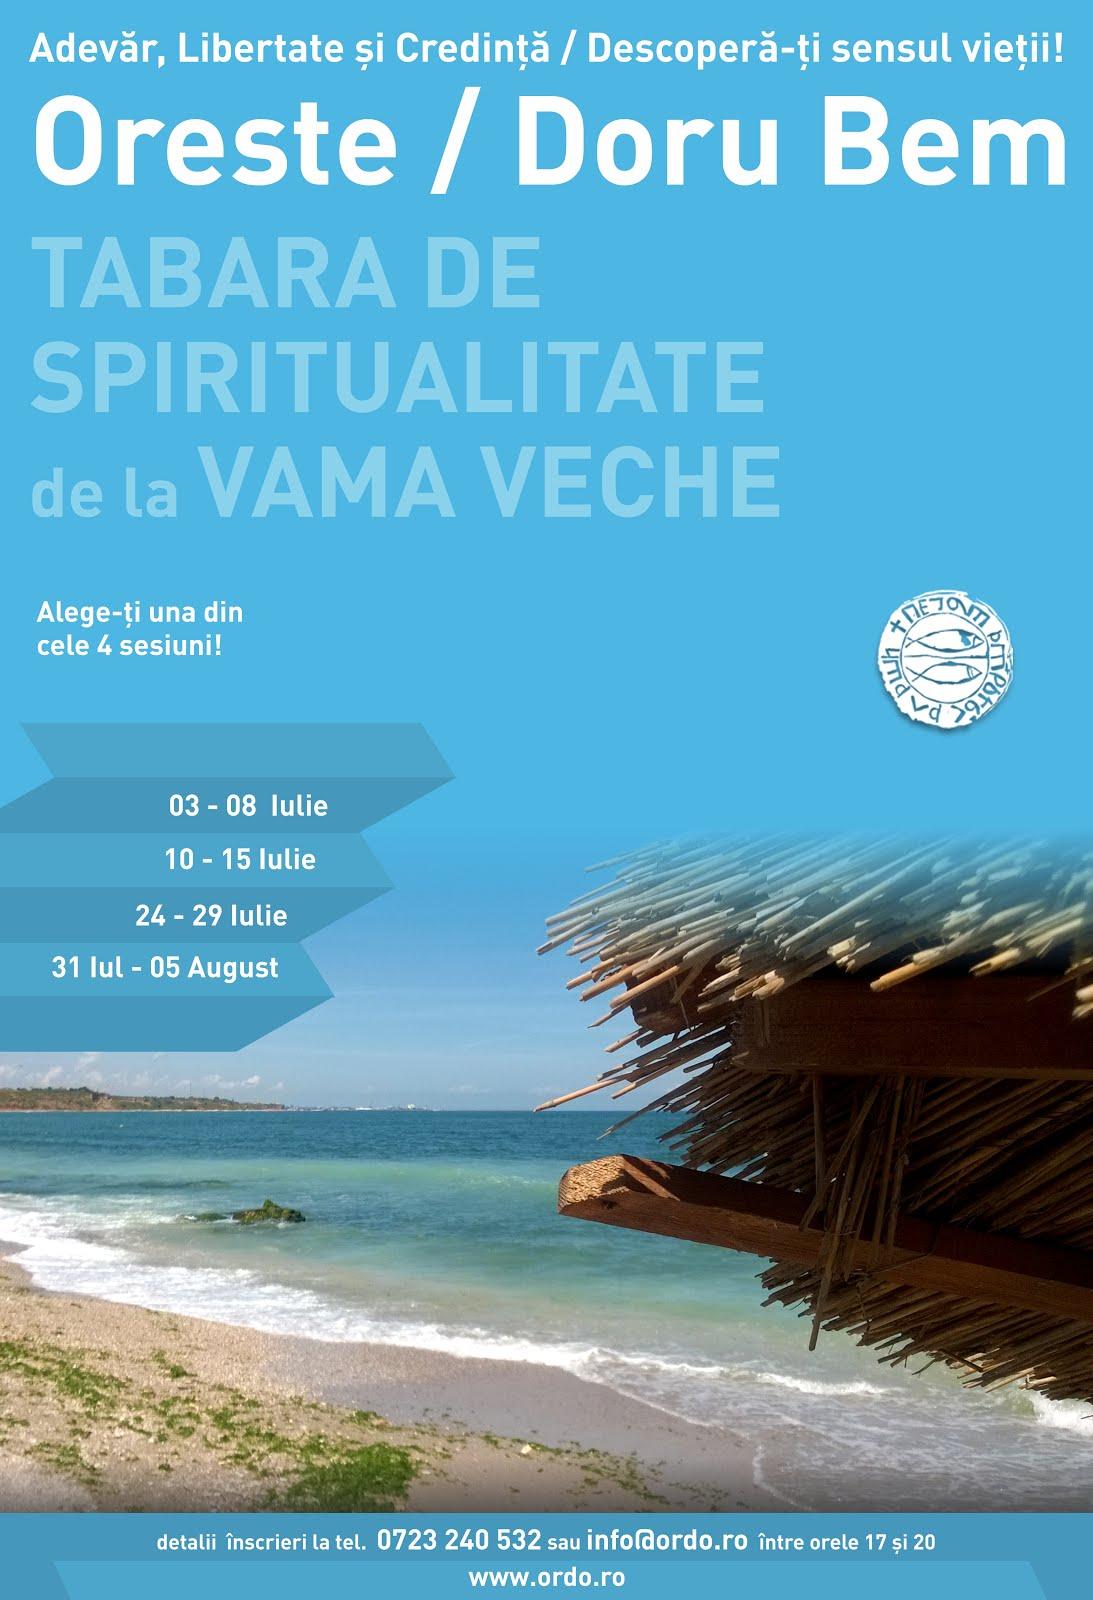 SESIUNILE TABEREI DE SPIRITUALITATE DE LA VAMA VECHE